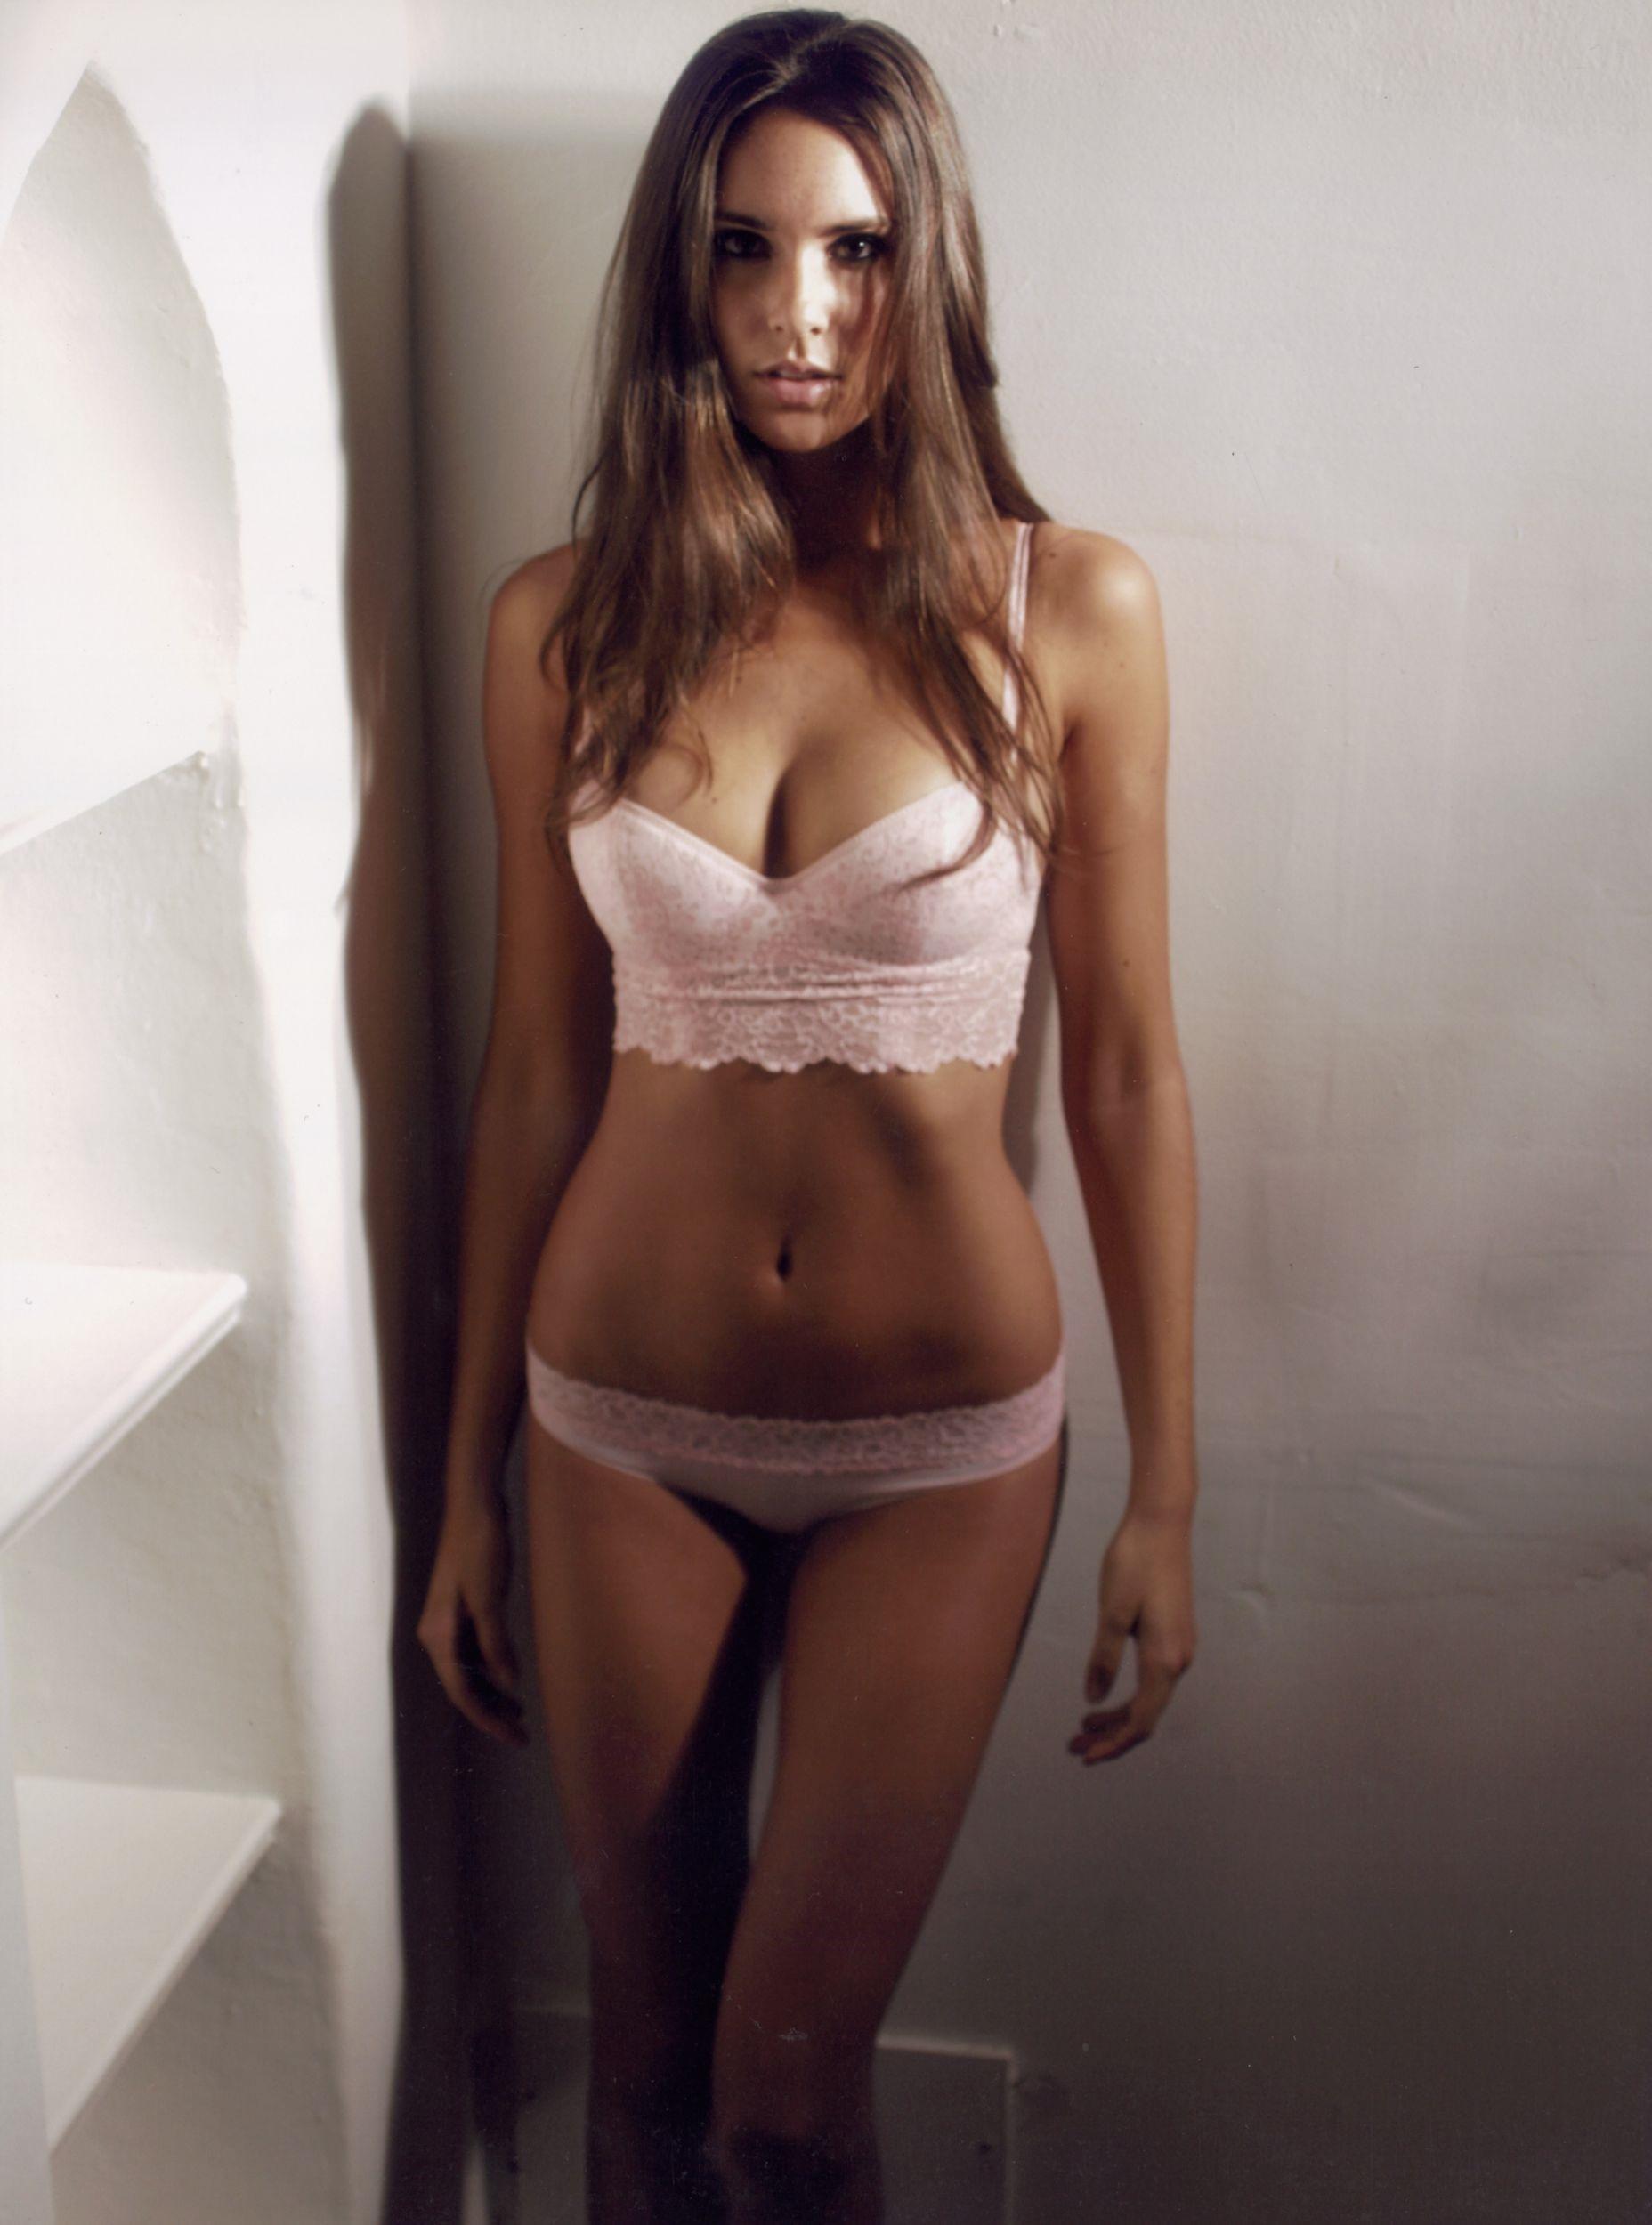 Ass Melinda Sward nudes (94 foto) Video, Snapchat, braless